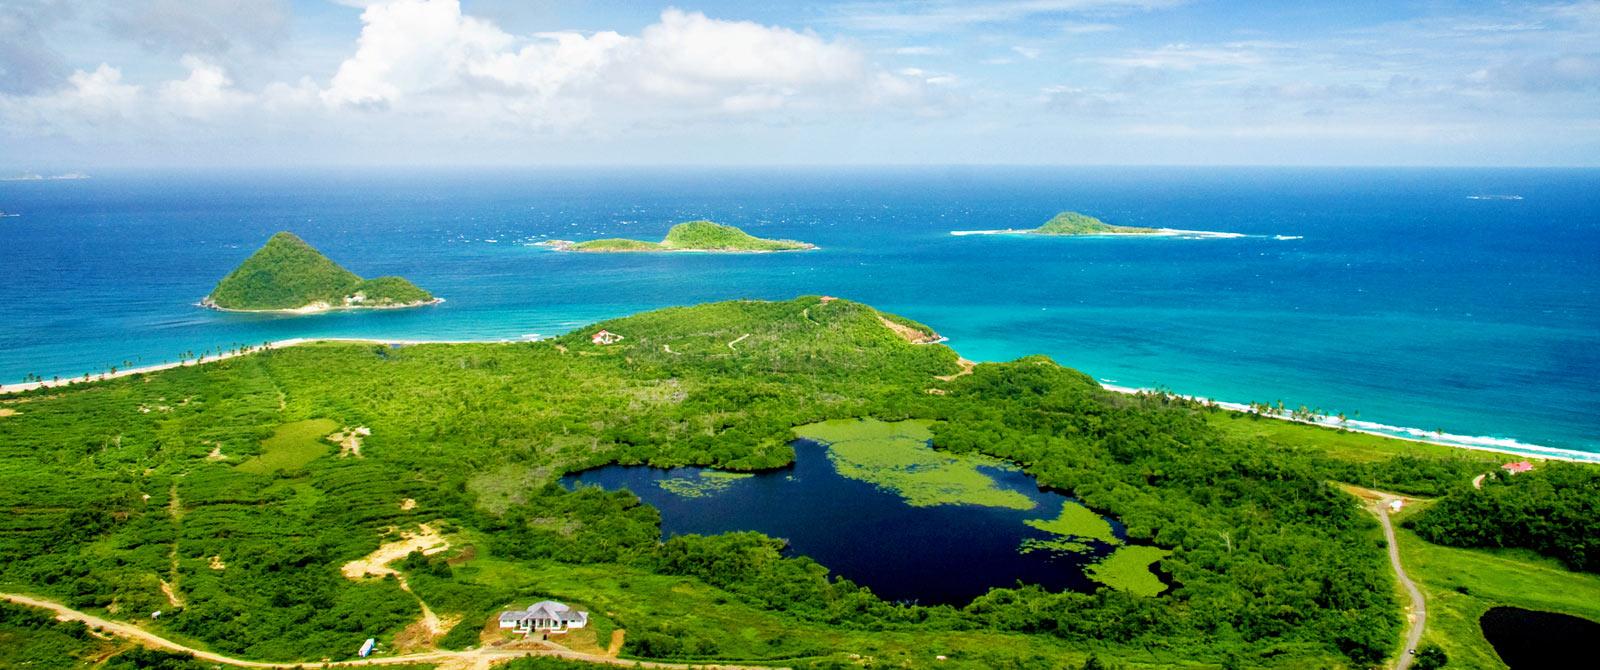 Grenada - Island